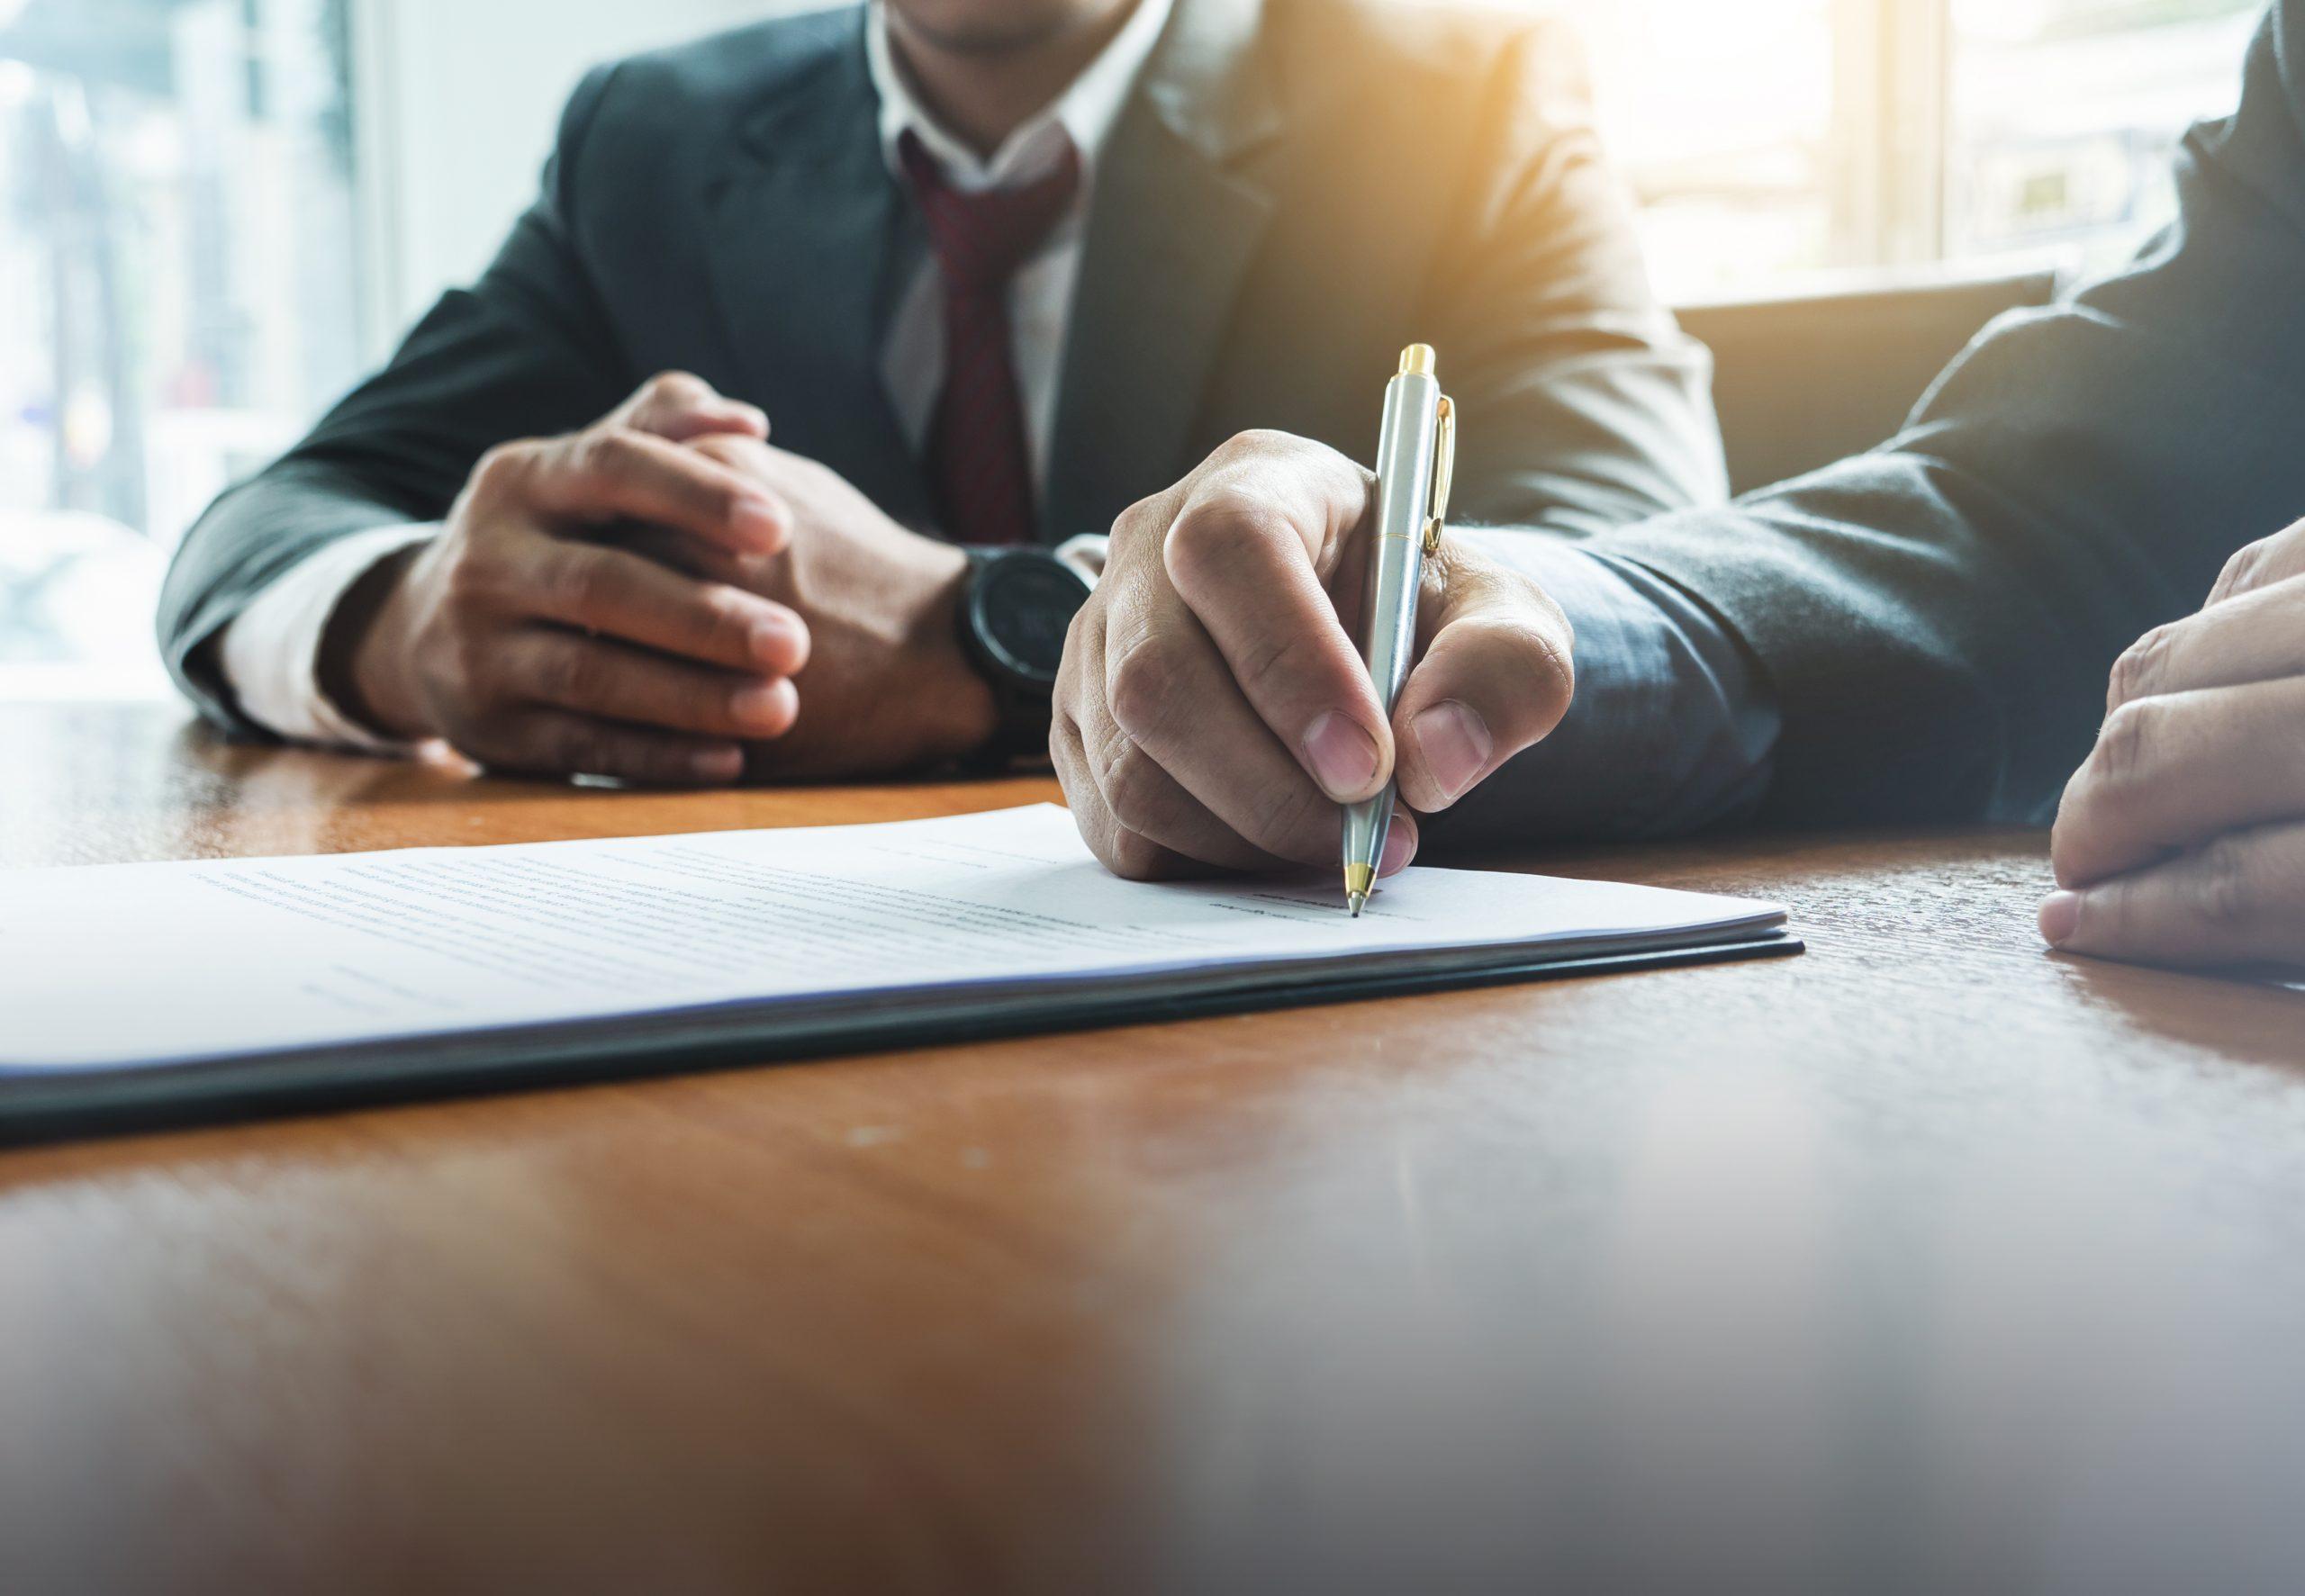 Modalidades de contrato de trabalho (Parte 1)